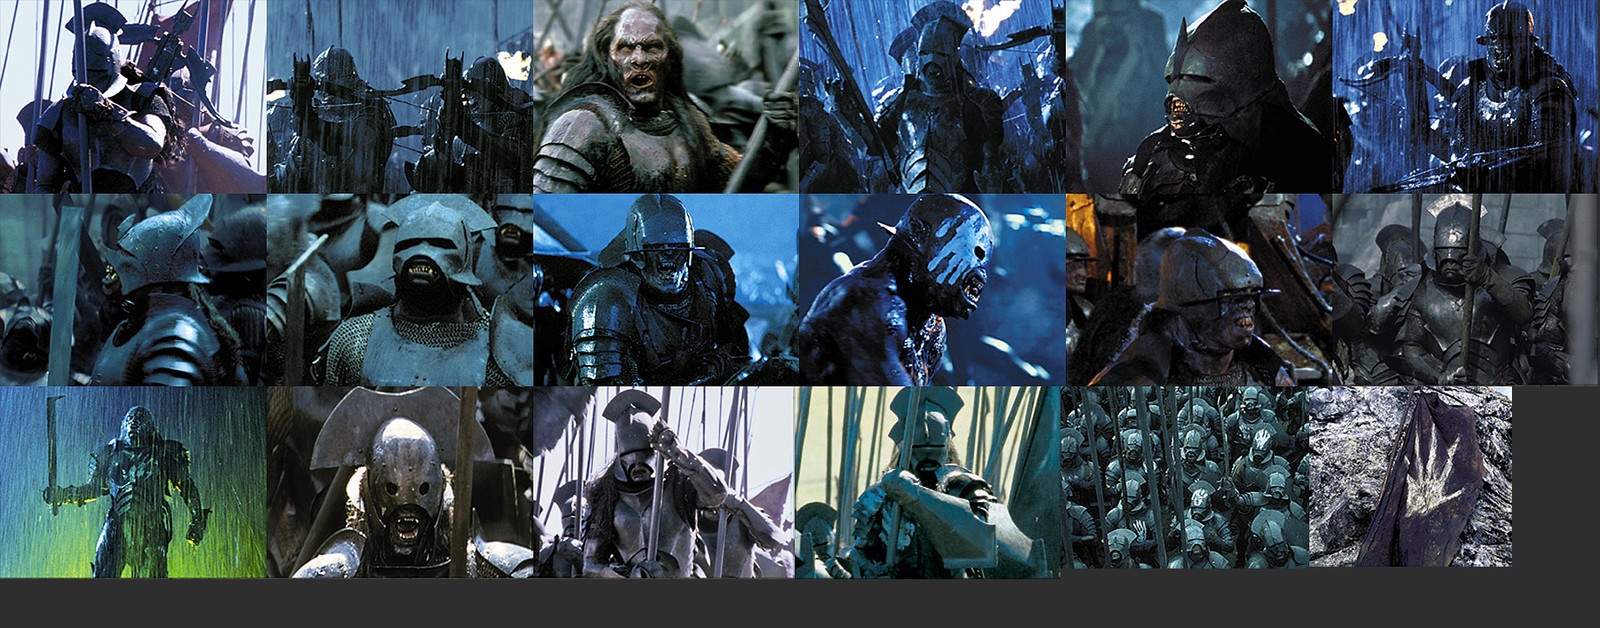 Uruk-hai variants from within the movie